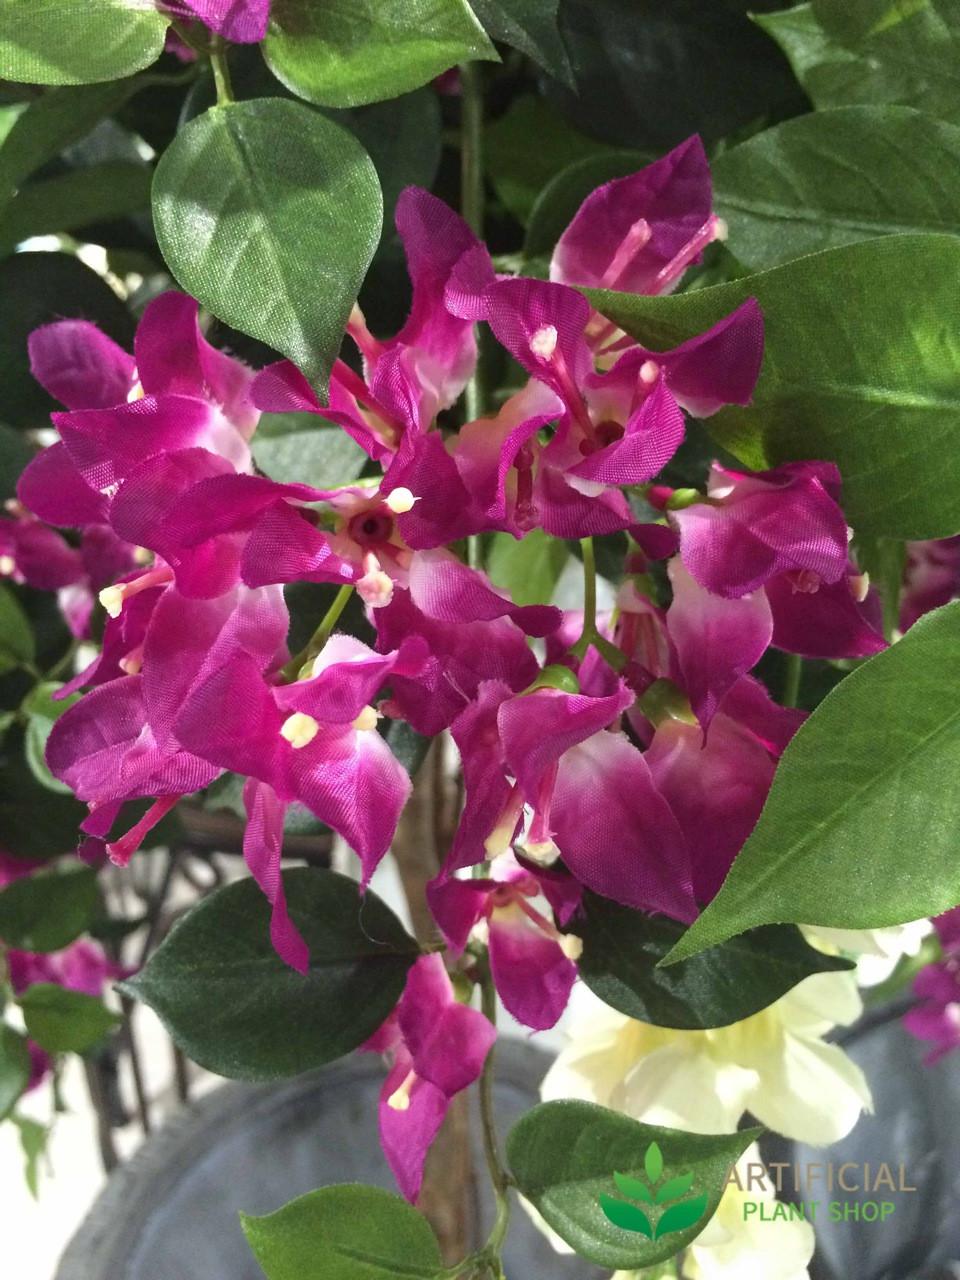 Artificial Bougainvillea flowers